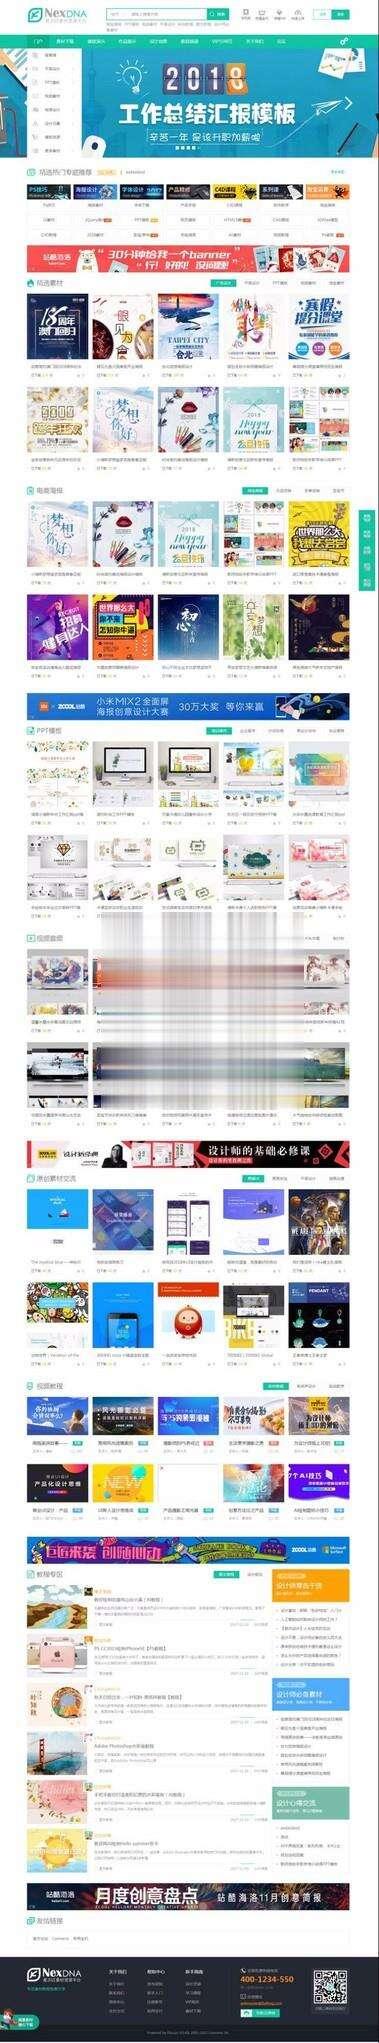 Discuz X3.4模板 宽屏素材教程资源商业版 GBK_源码下载插图